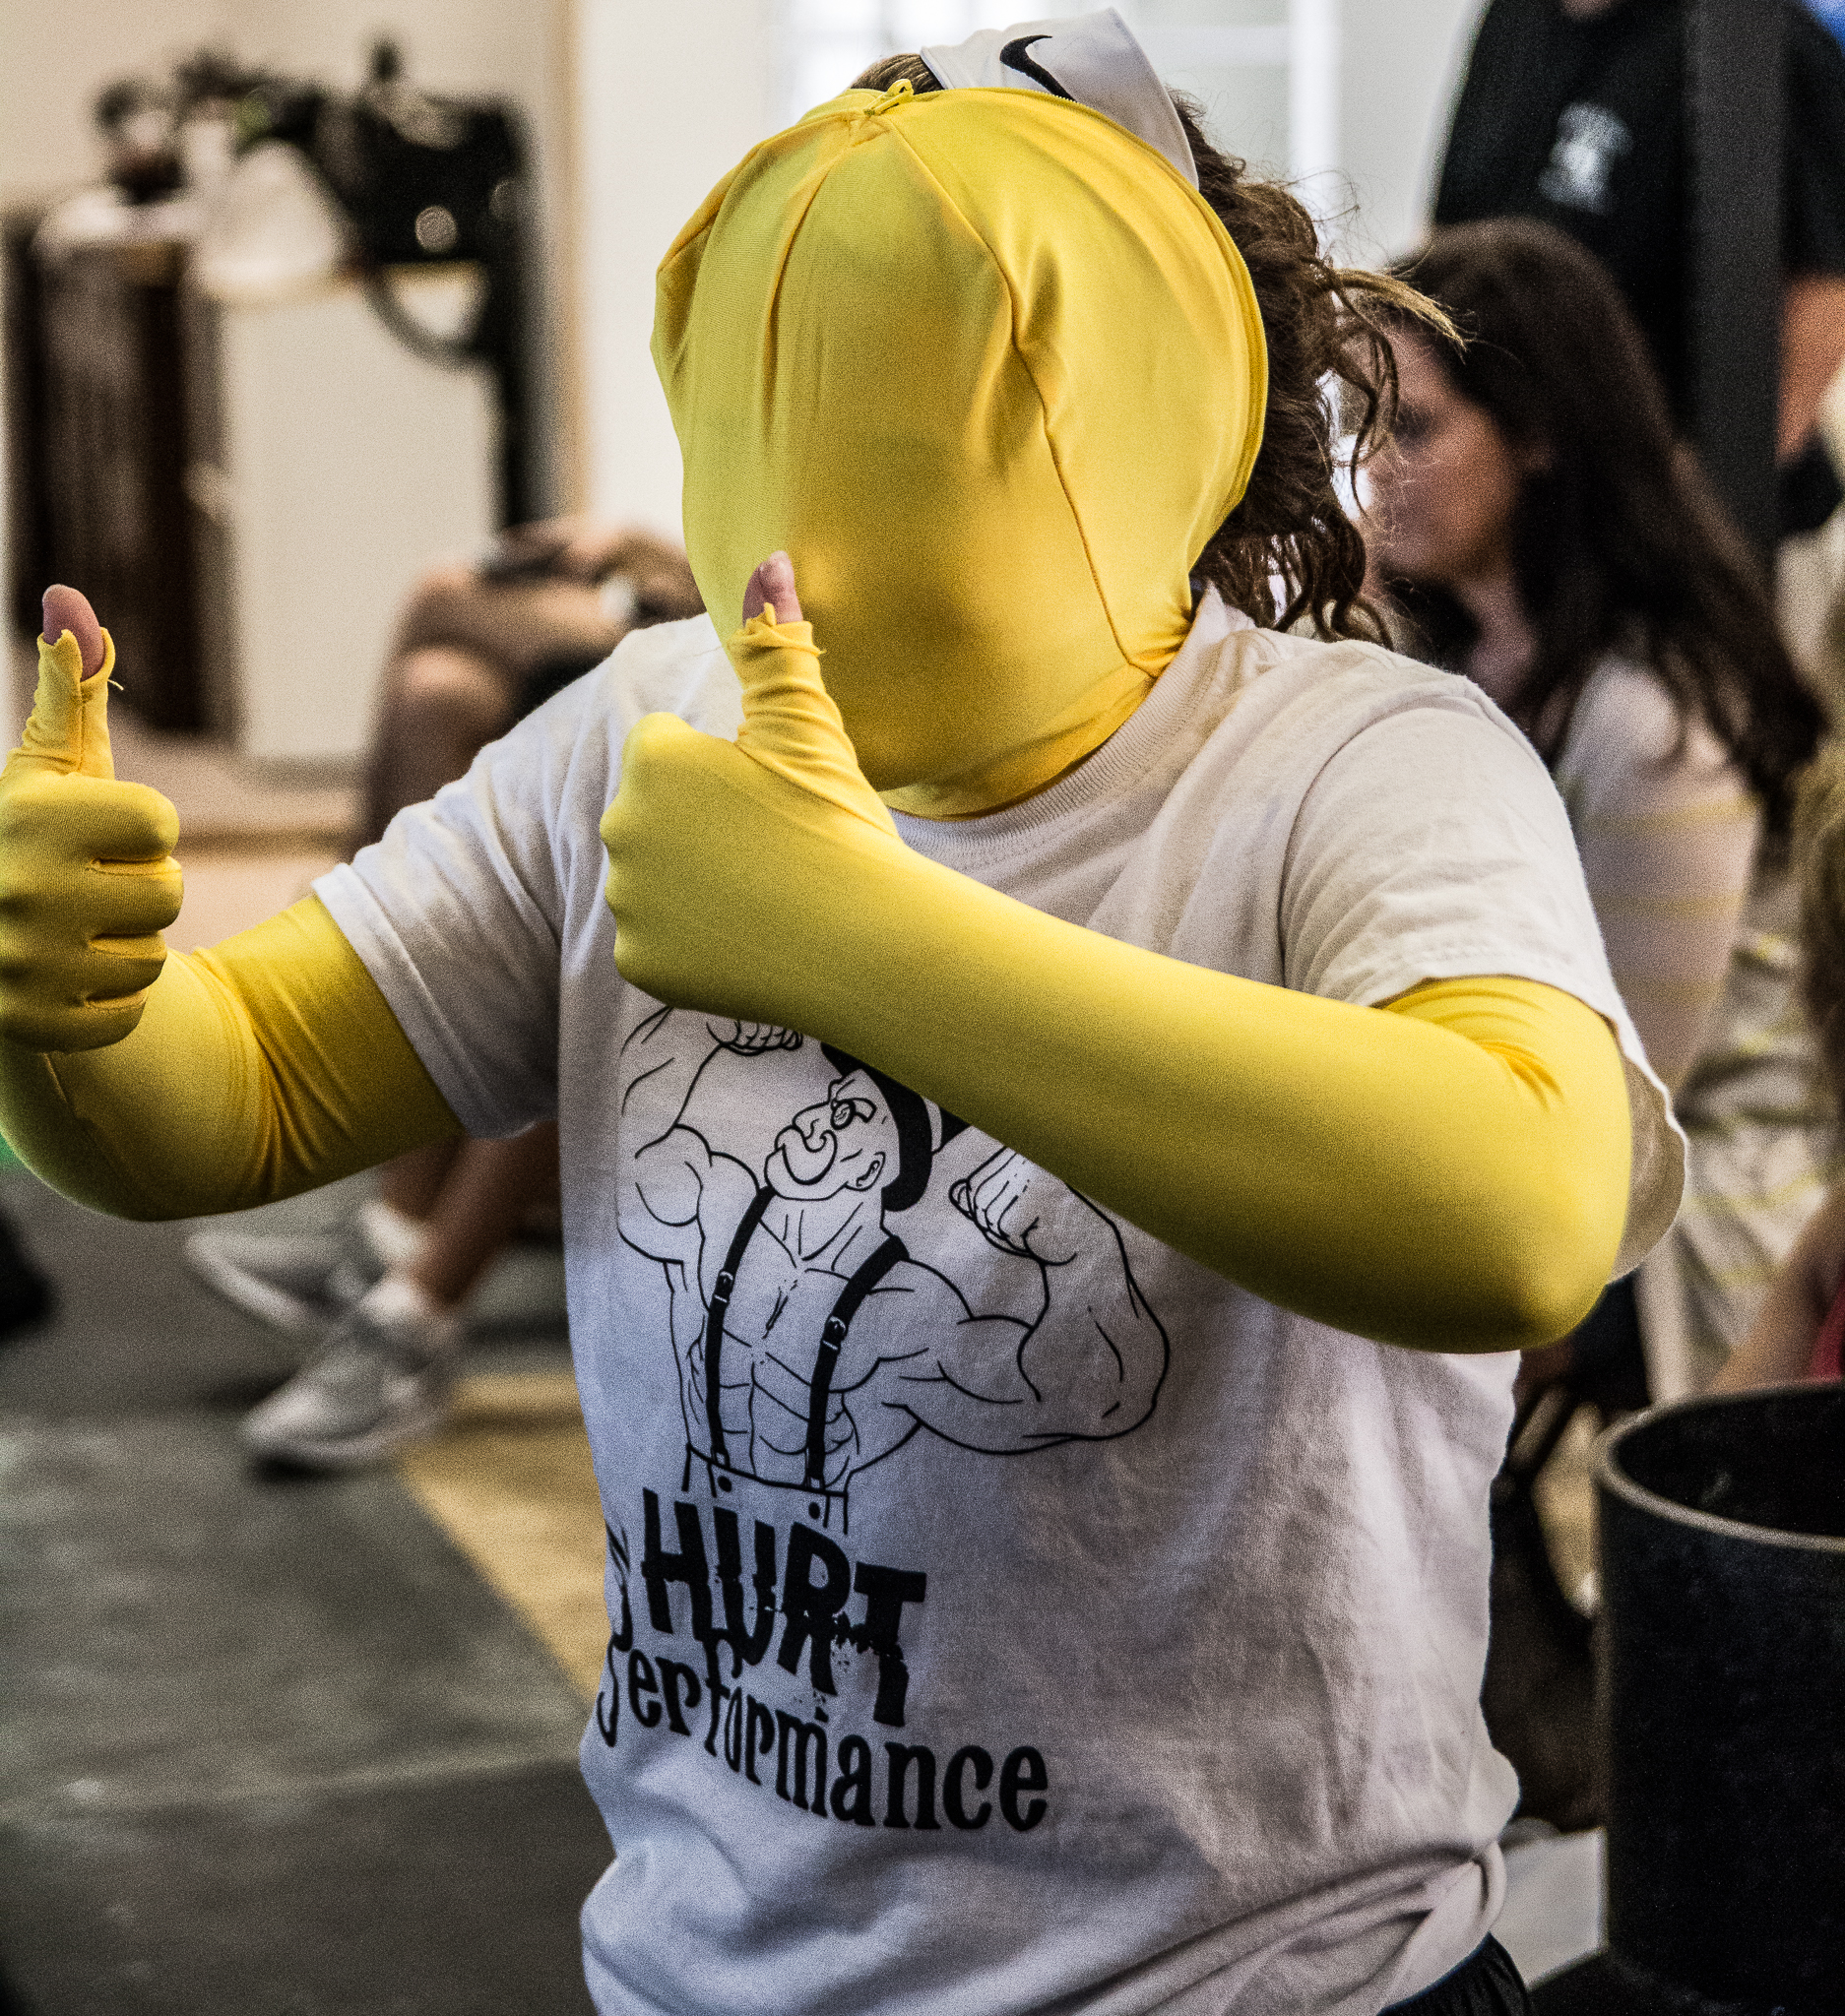 hurt-performance-4th-annual-little-viking-charity-washingtonville-new-york-strongman-eveyrdaylifters-vp (148 of 348).jpg